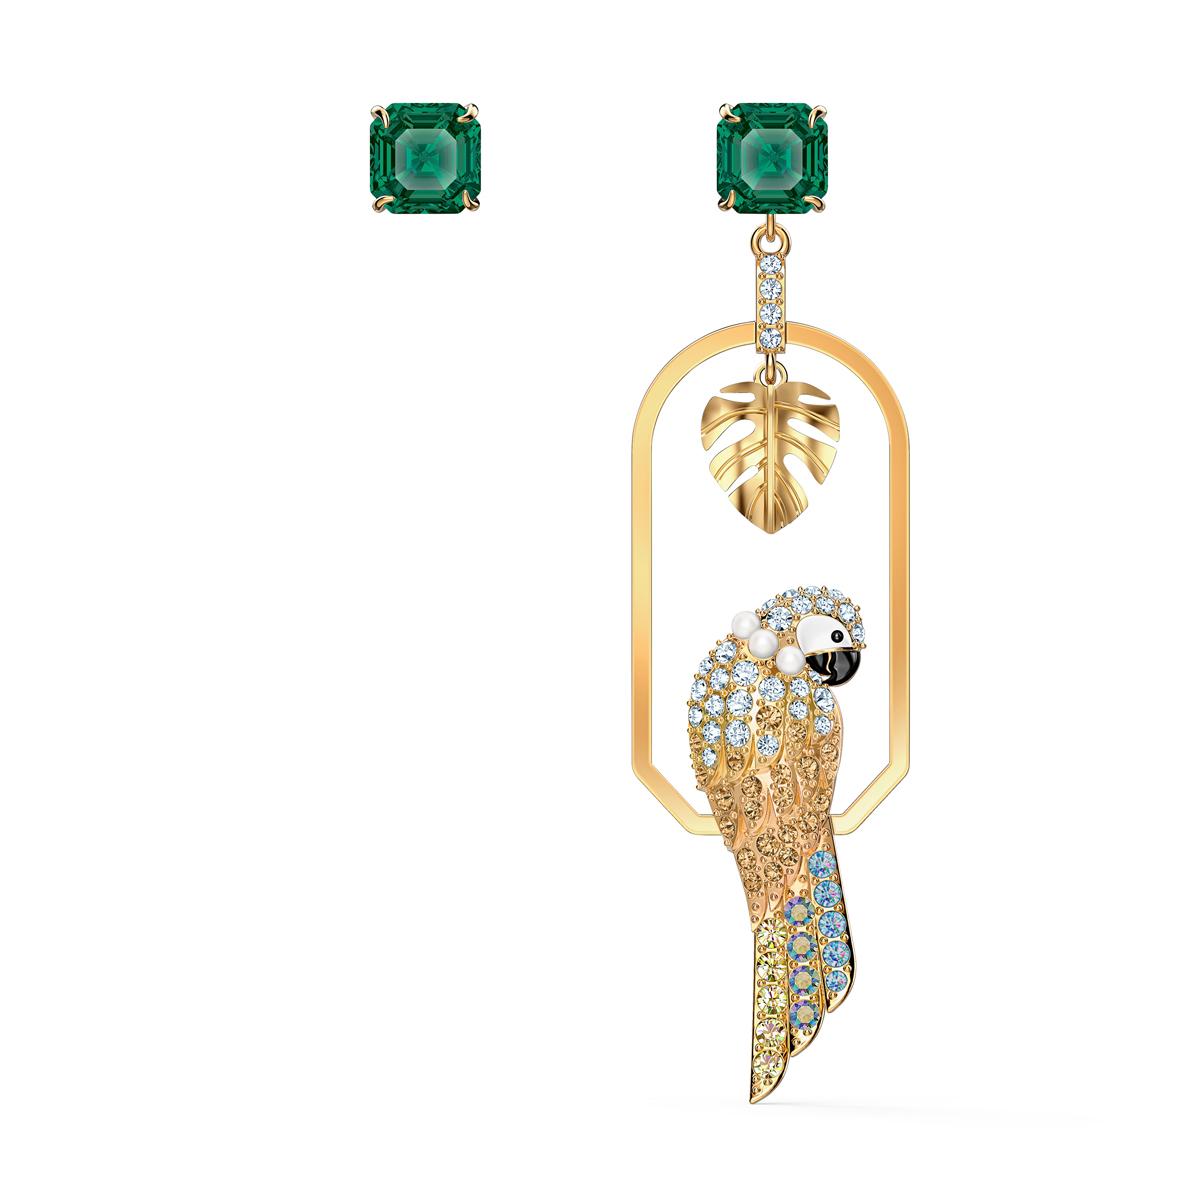 Swarovski Tropical Pierced Earrings Parrot Small Light Multi Gold